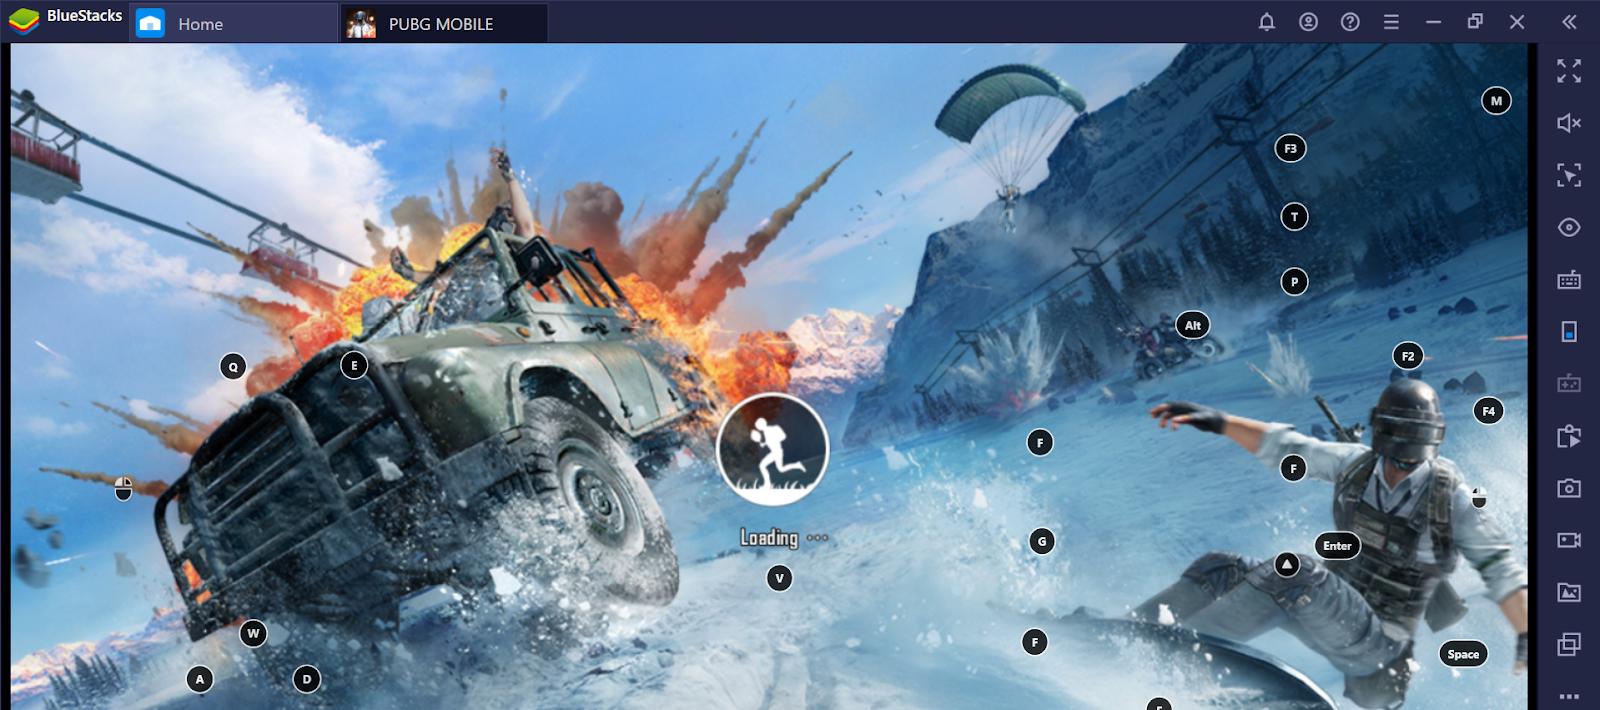 BlueStacks App Player 4.200.0.5201